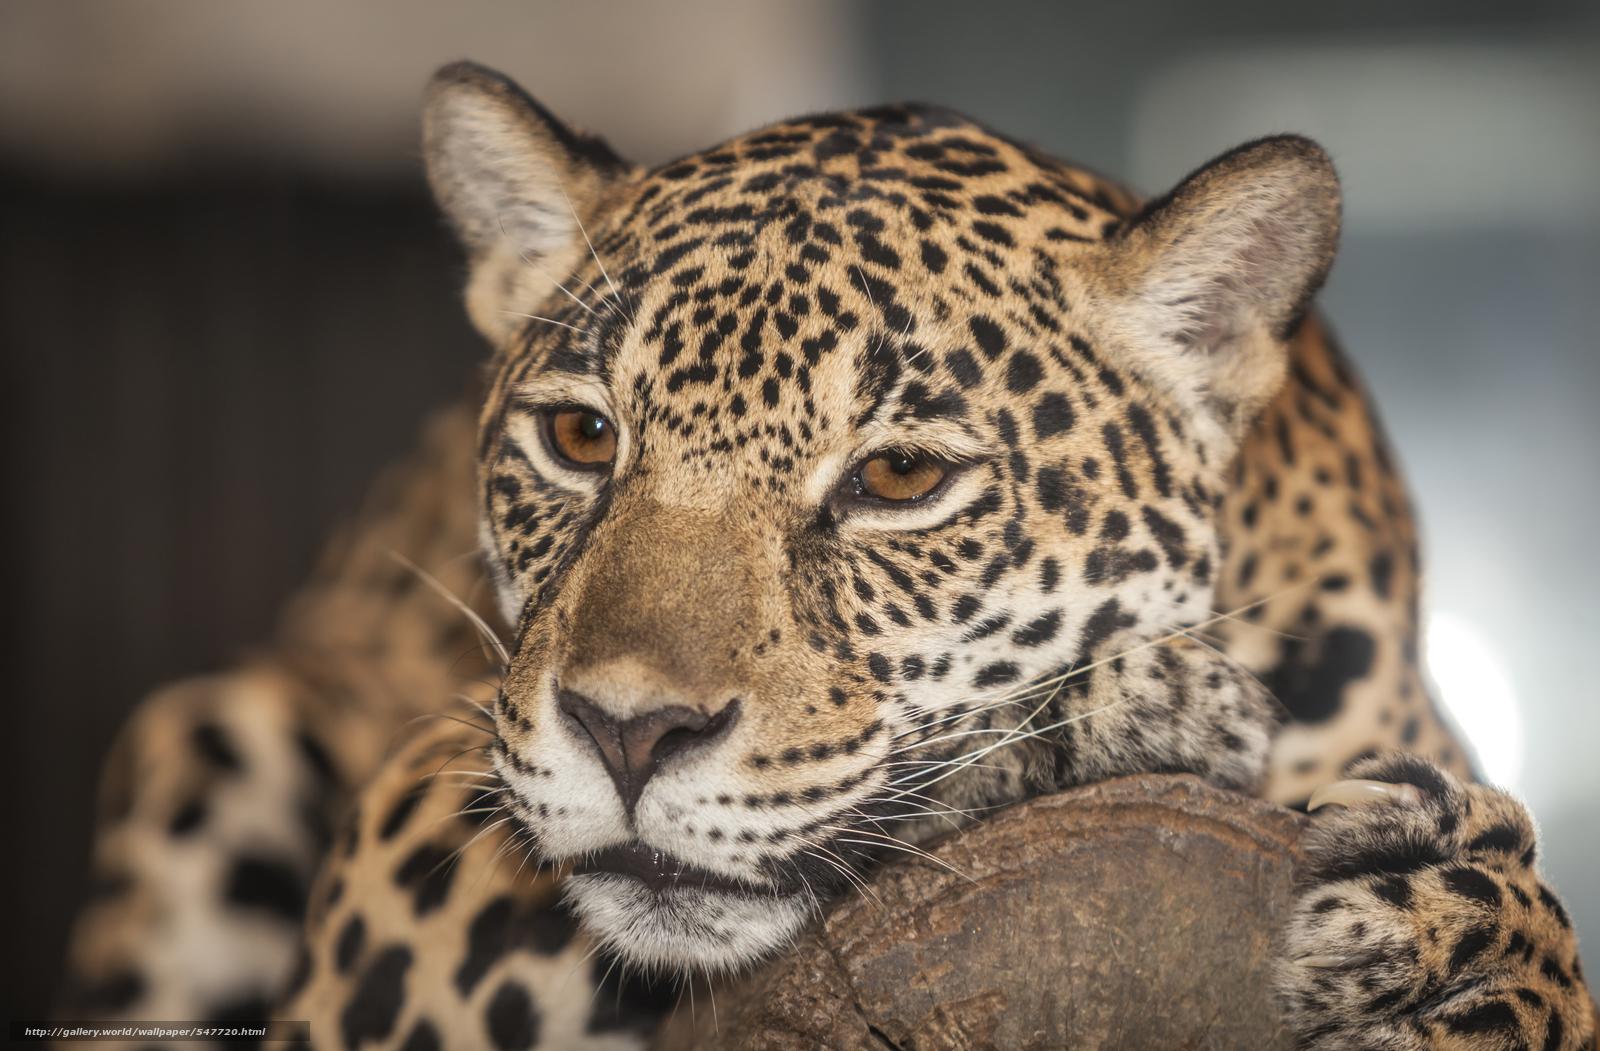 Hd wallpaper leopard - Pobra Tapety Lampart Zwierz Cy Drapie Nik Darmowe Tapety